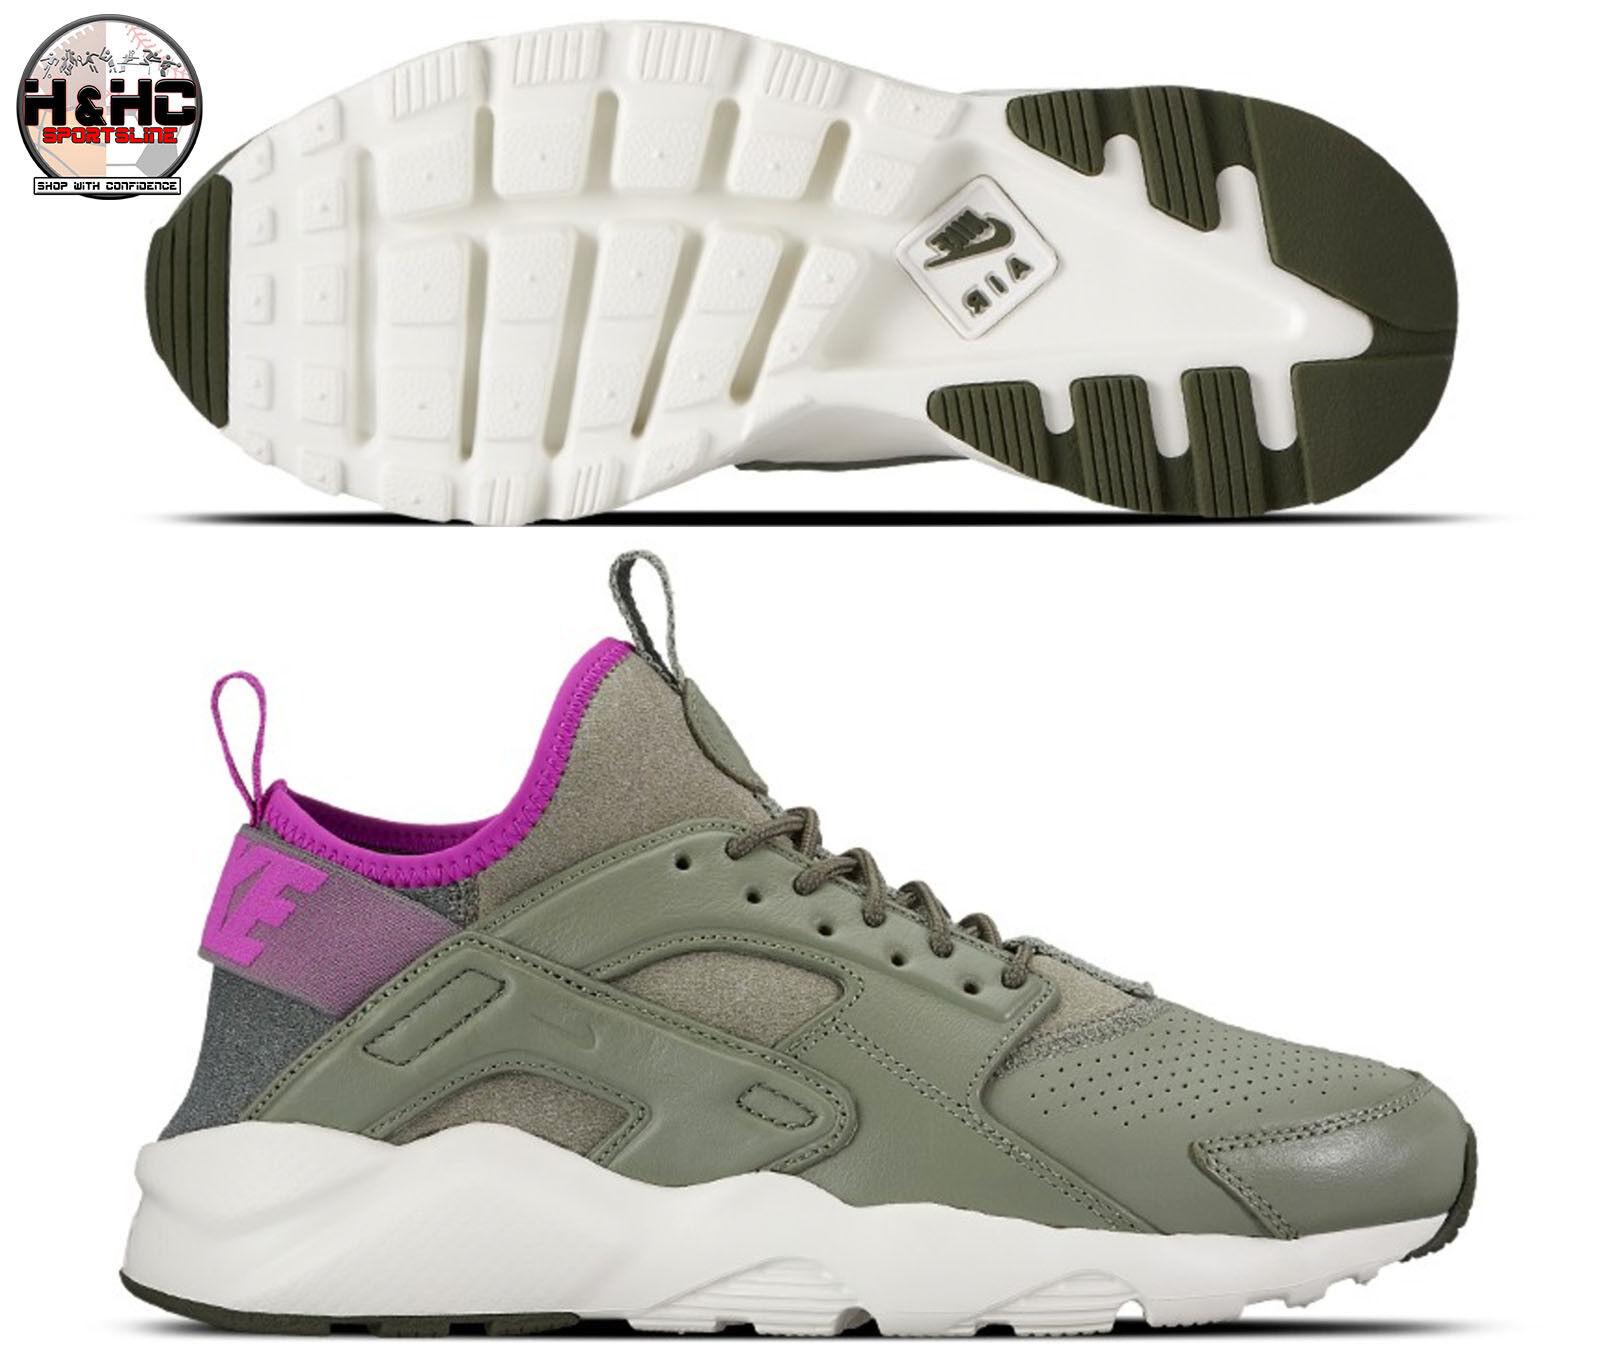 Nike se air huarache correre ultra se Nike 875841 003 buio stucco / viola scarpe da uomo 023cce